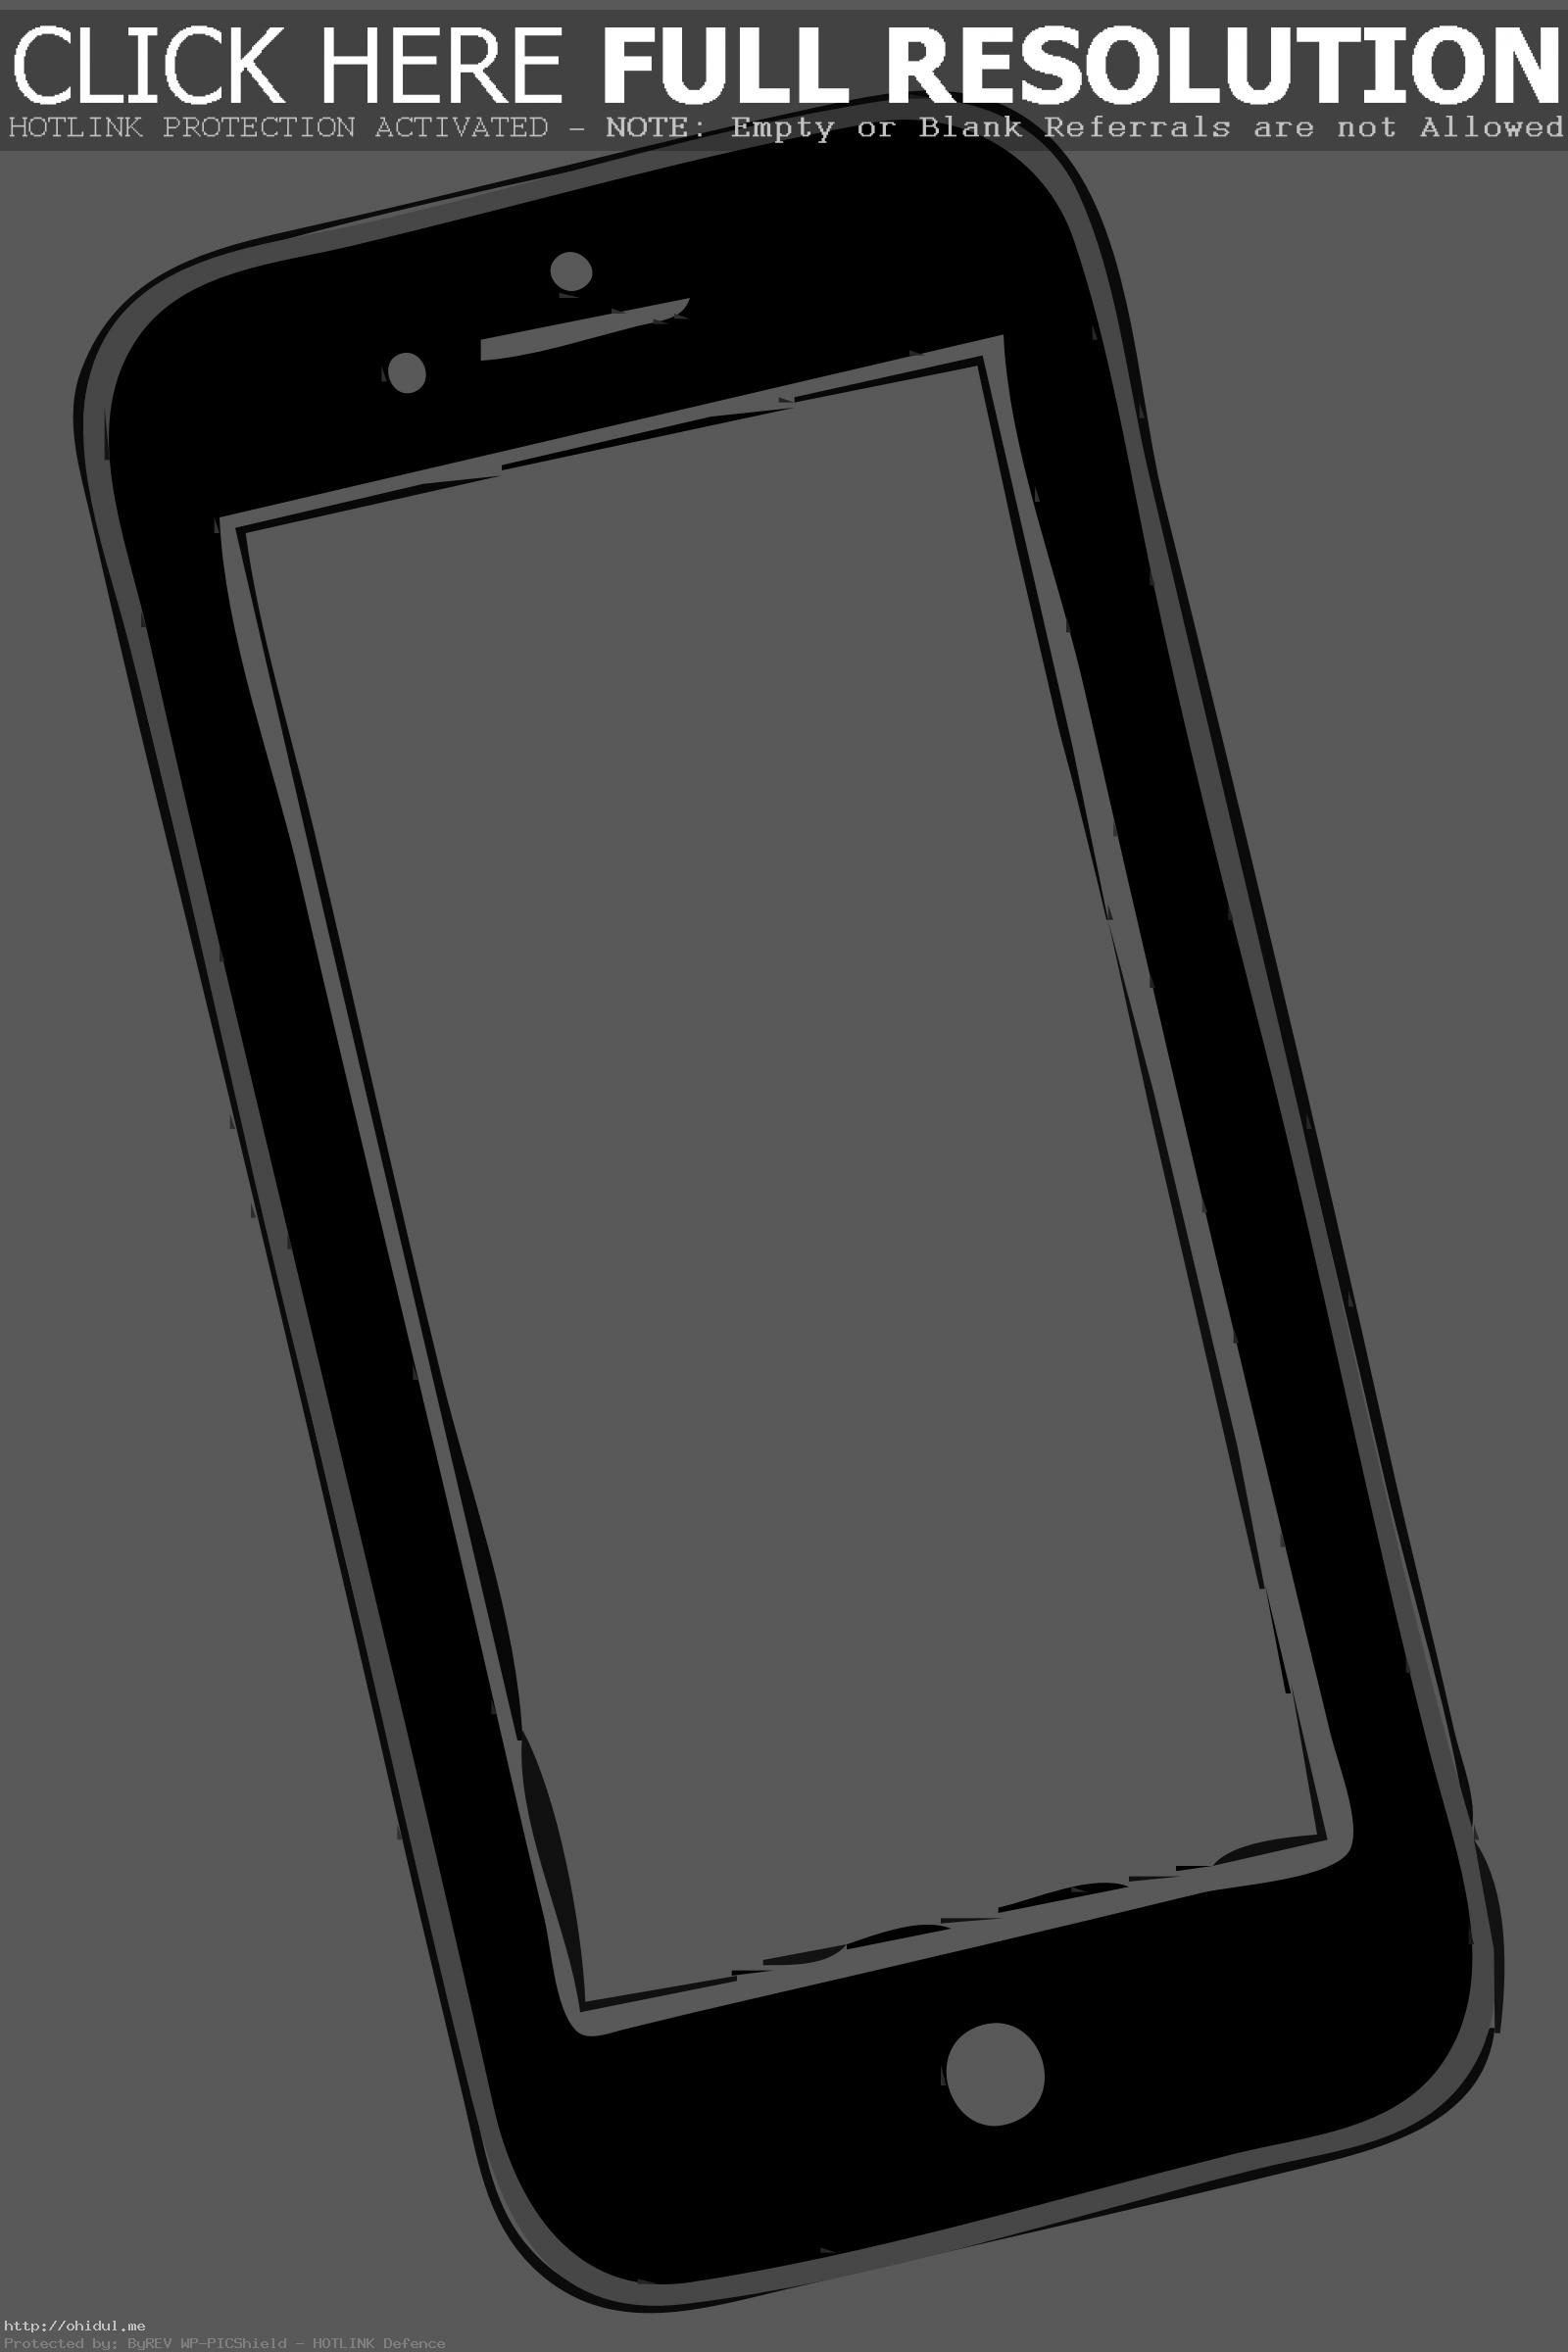 . ClipartLook.com Phone Clipart 44 Backgrounds At ClipartLook.com